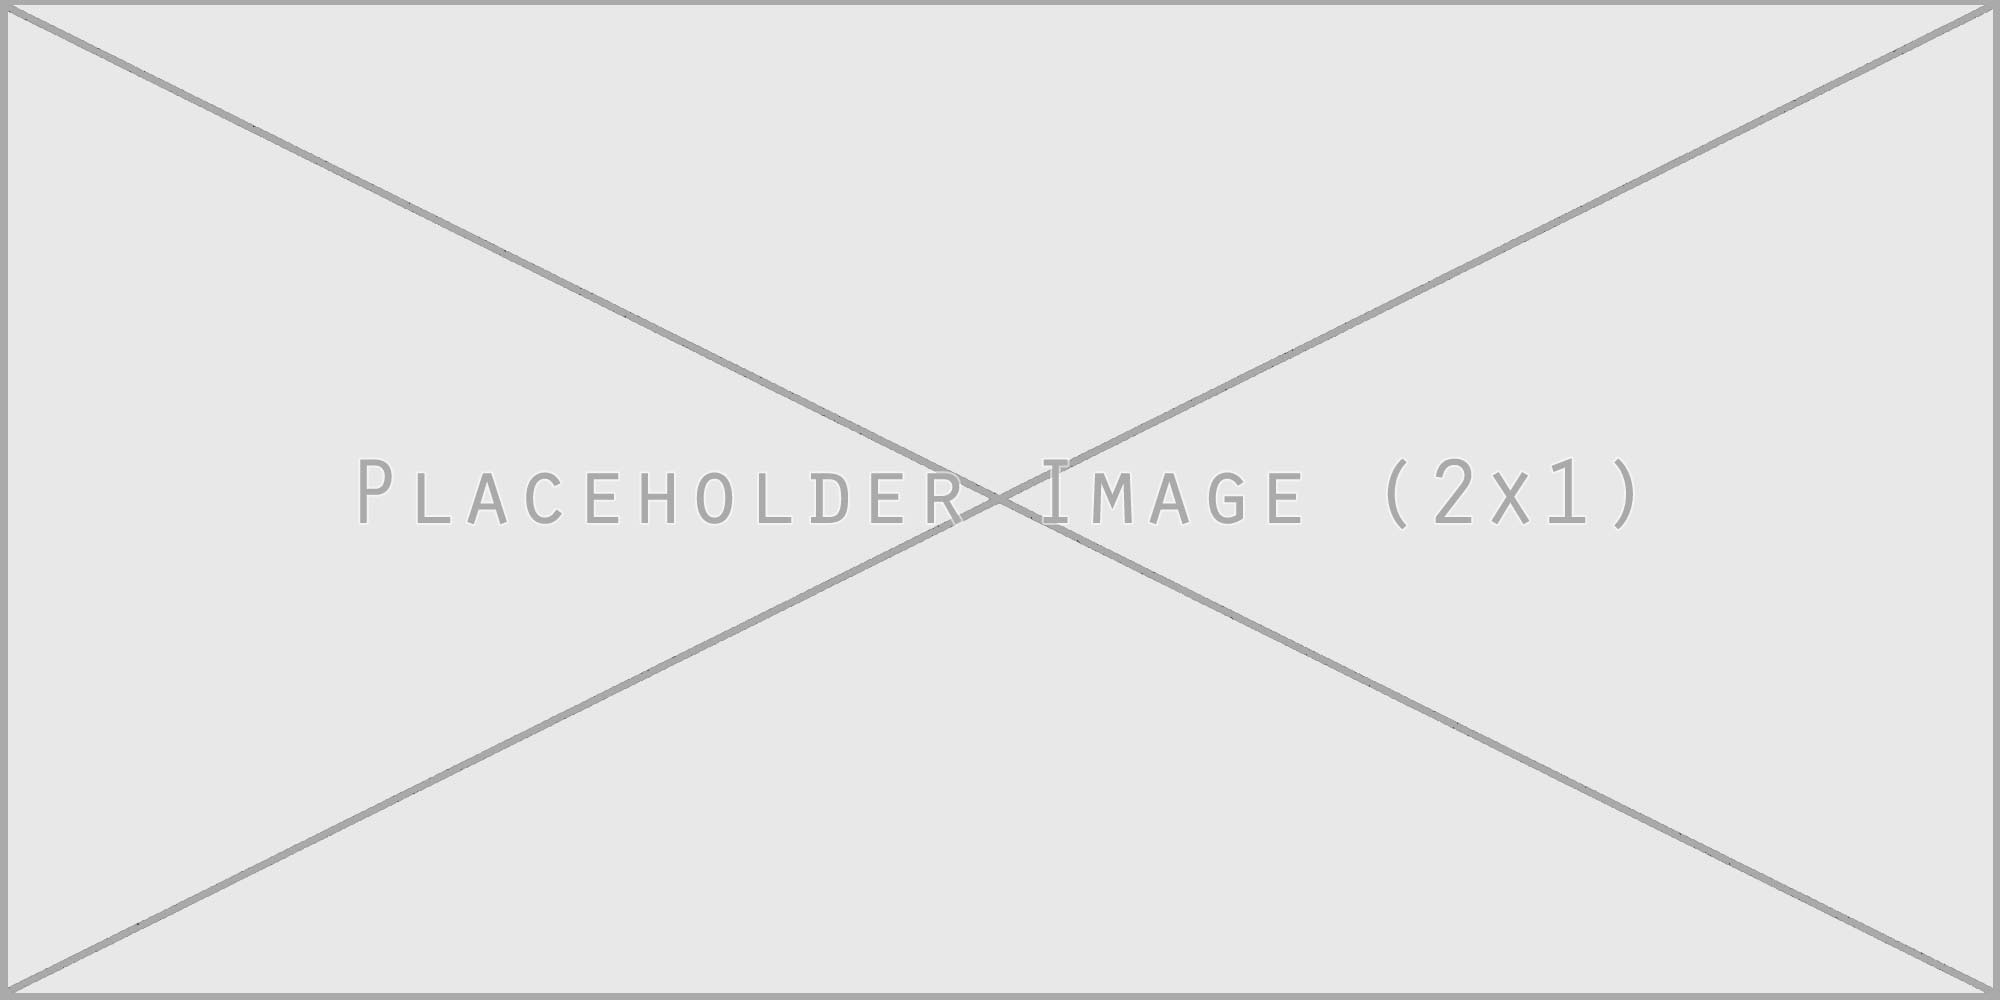 Placeholder Image-2x1